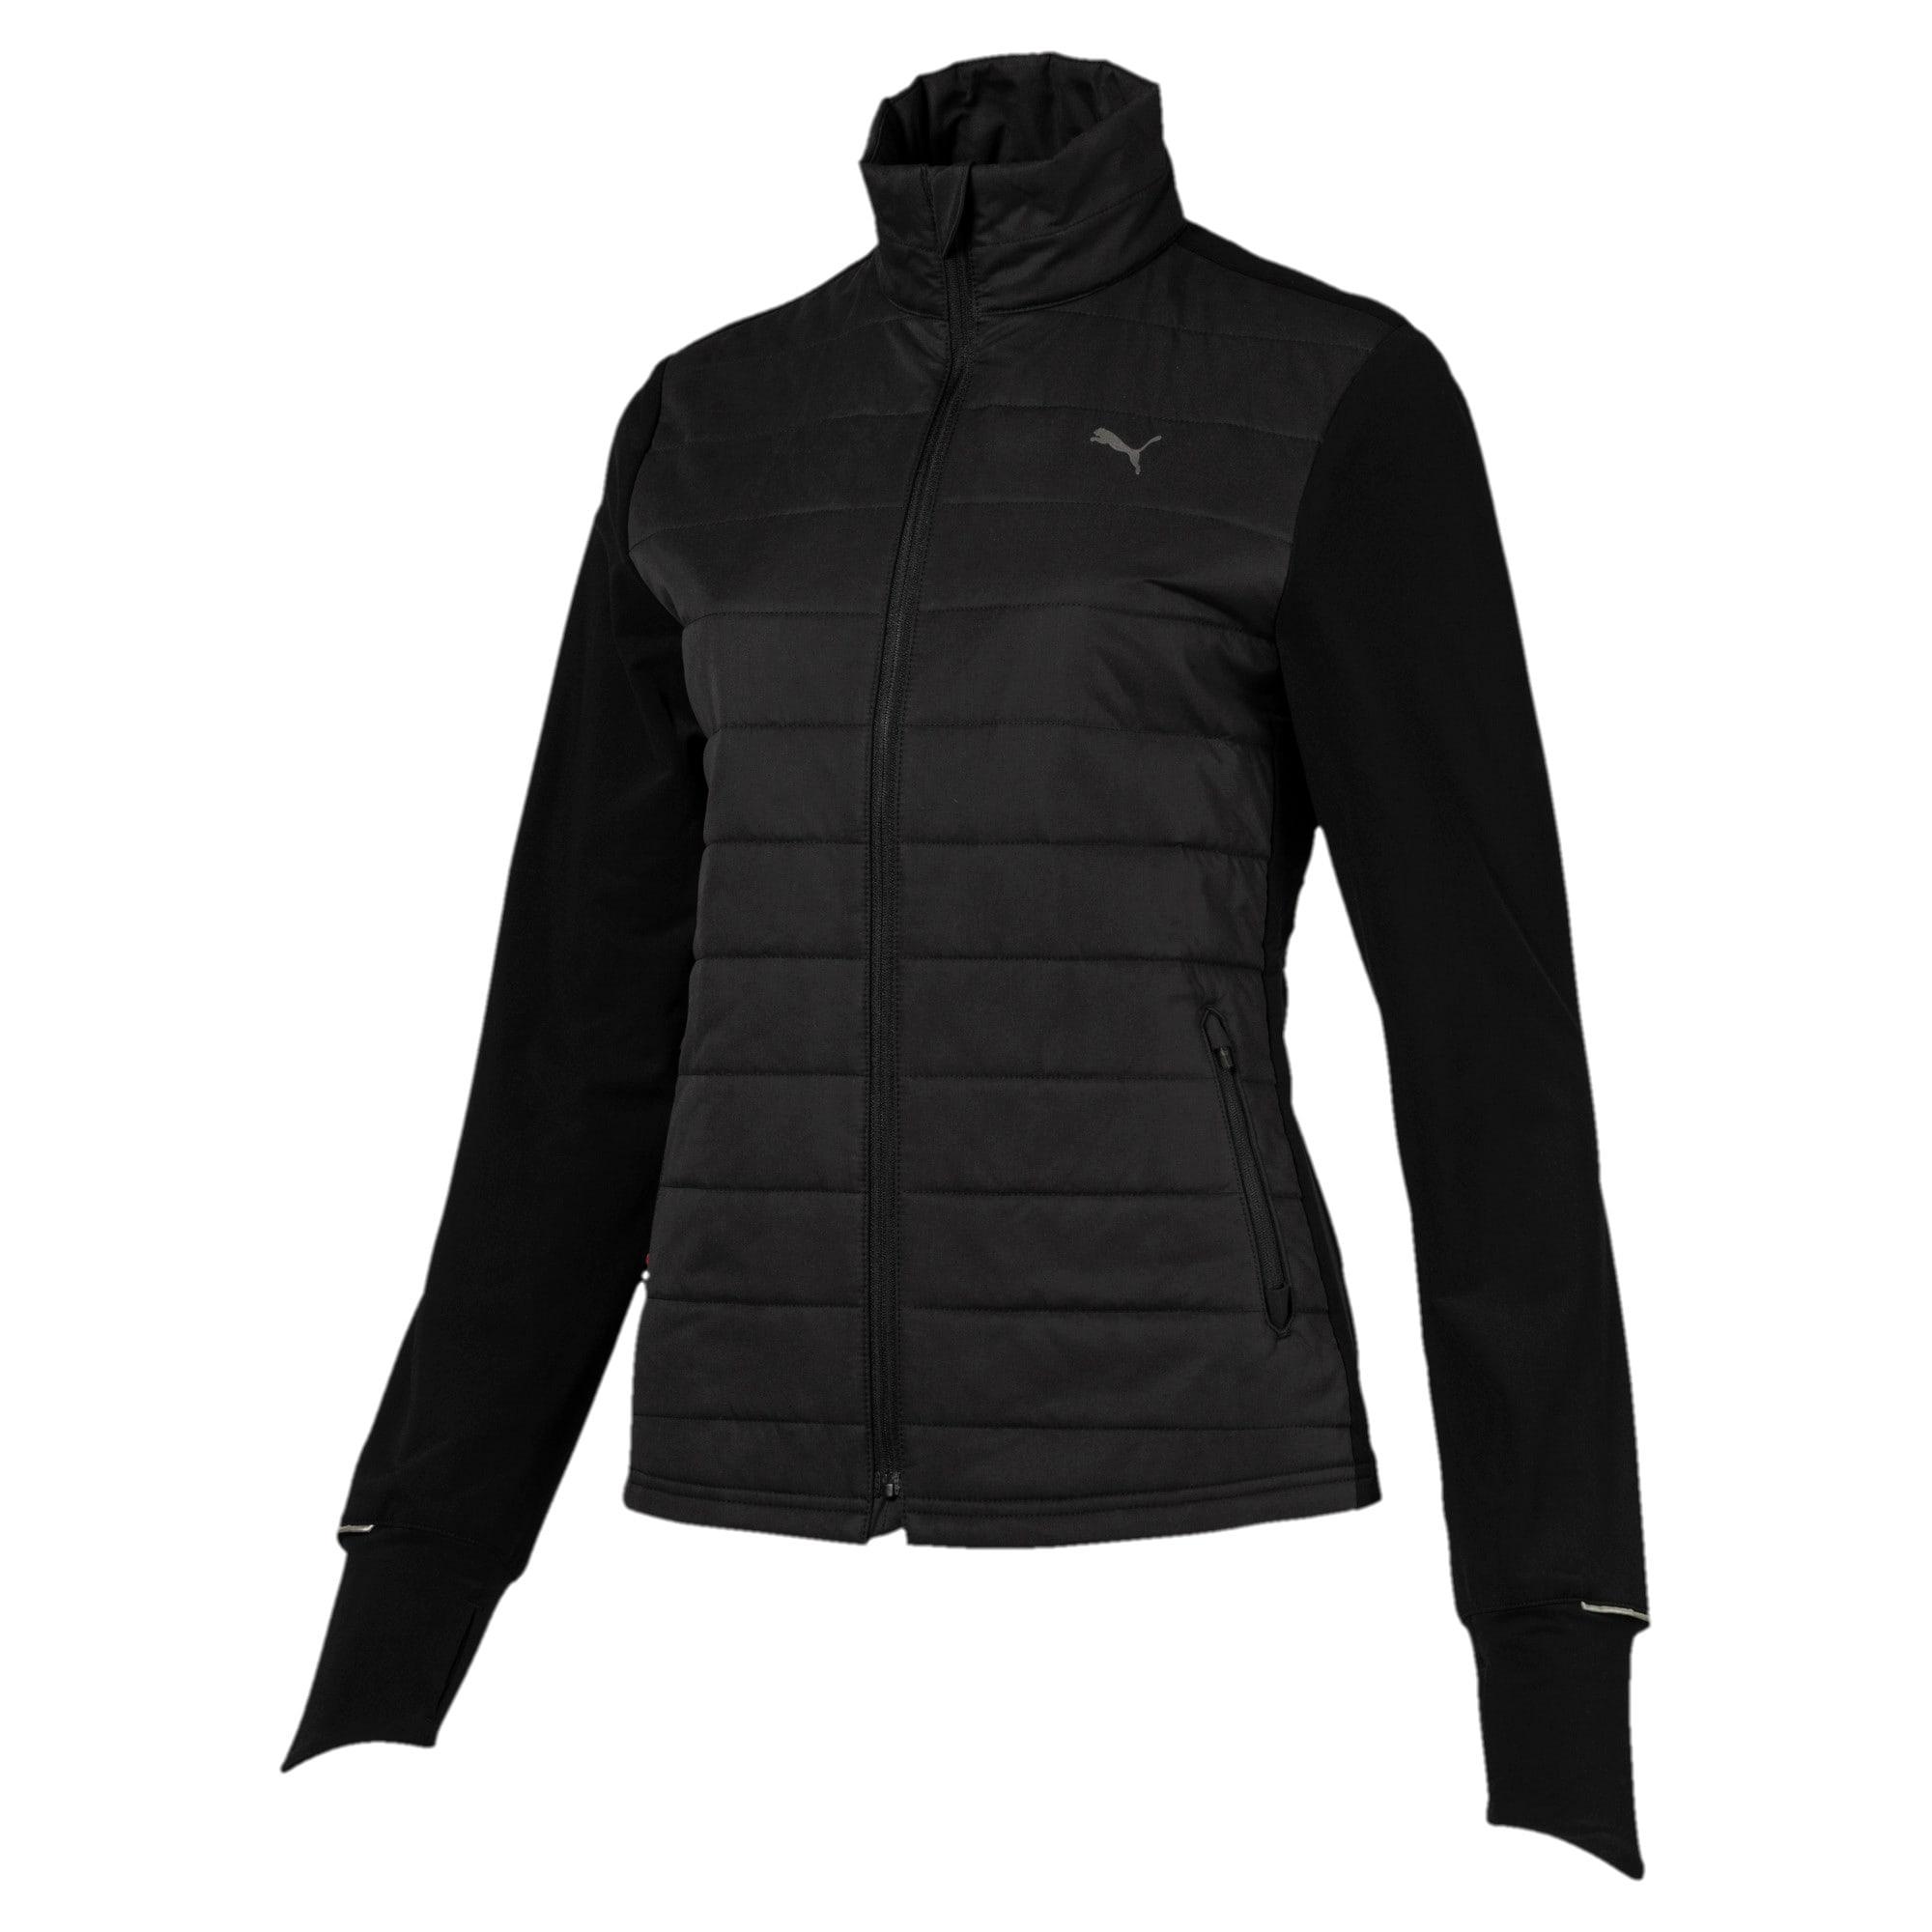 Thumbnail 1 of Winter Zip-Up Women's Jacket, Puma Black, medium